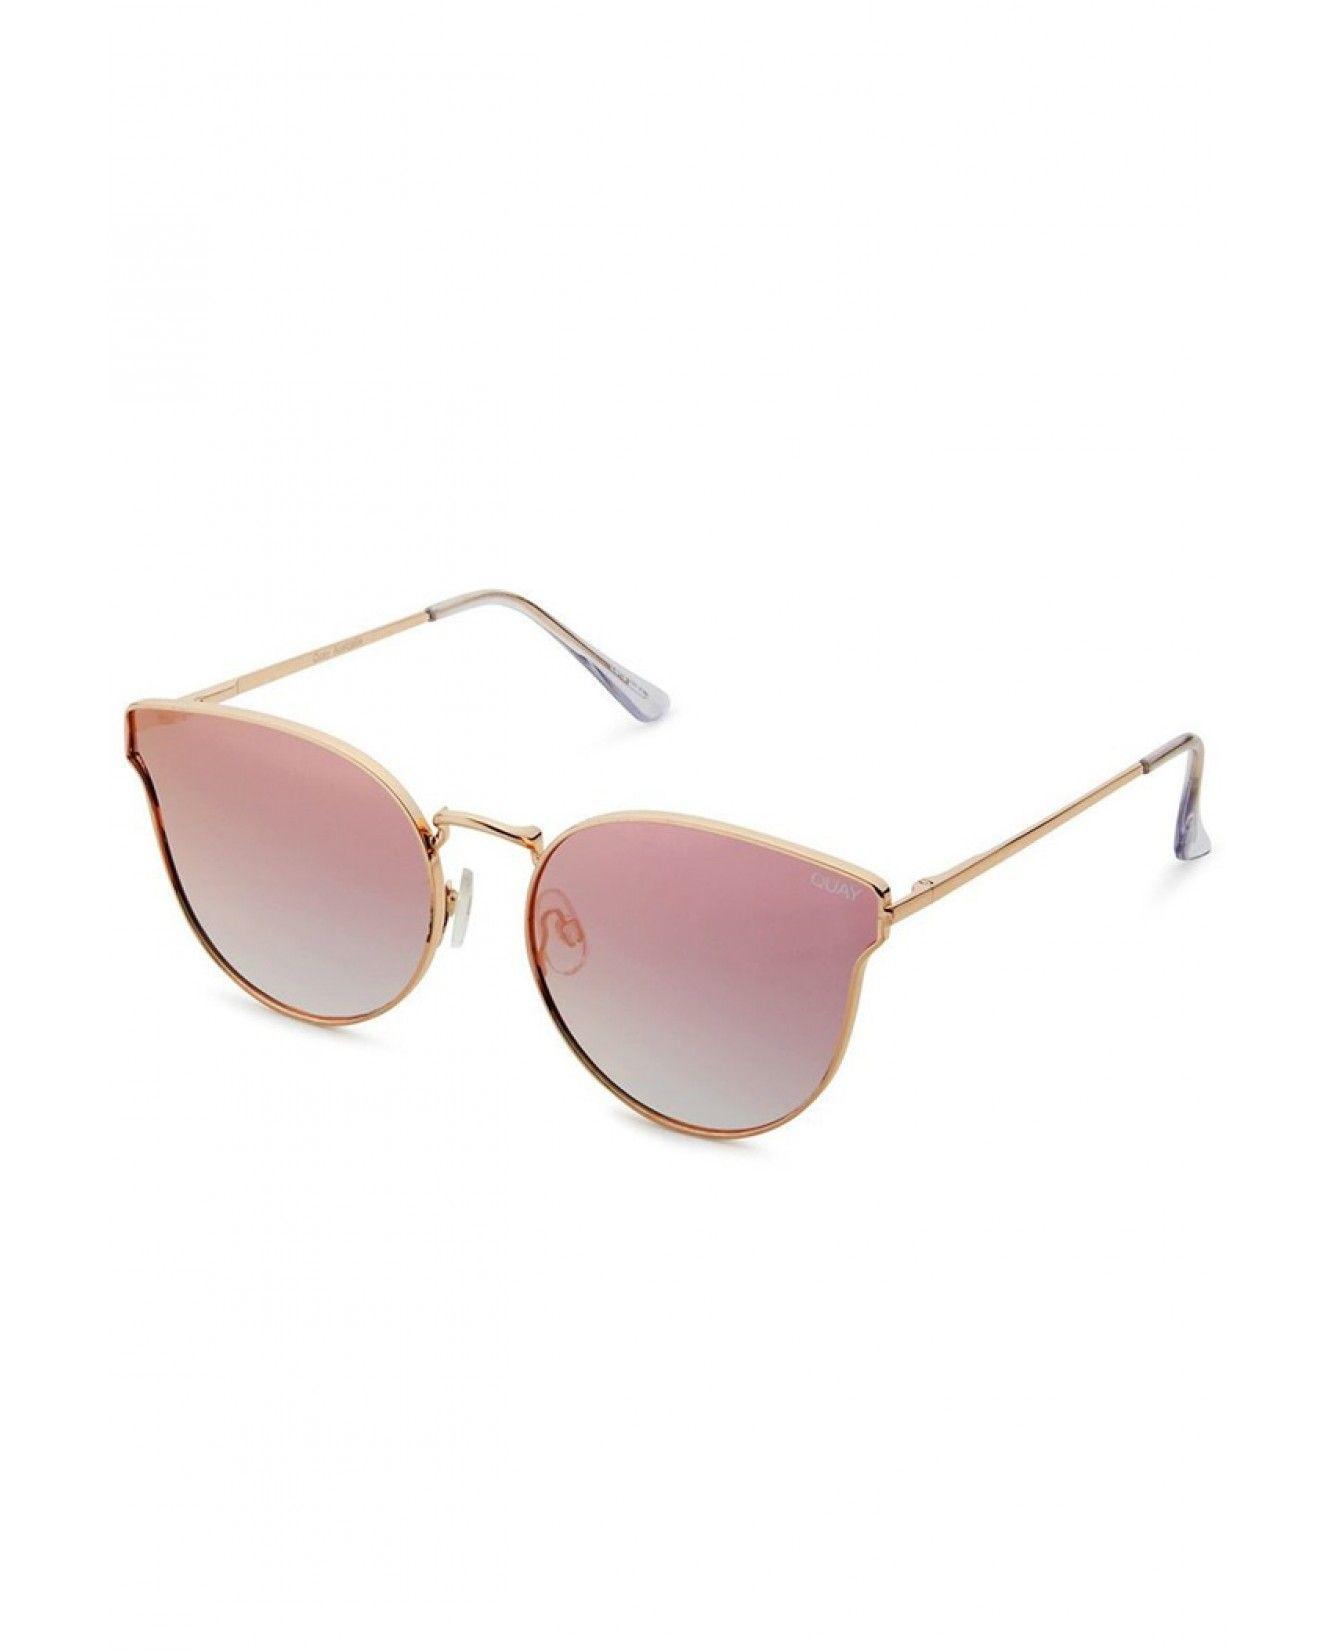 f9ef0d1a2d Quay Eyewear Australia All My Love Sunglasses - Rose Pink